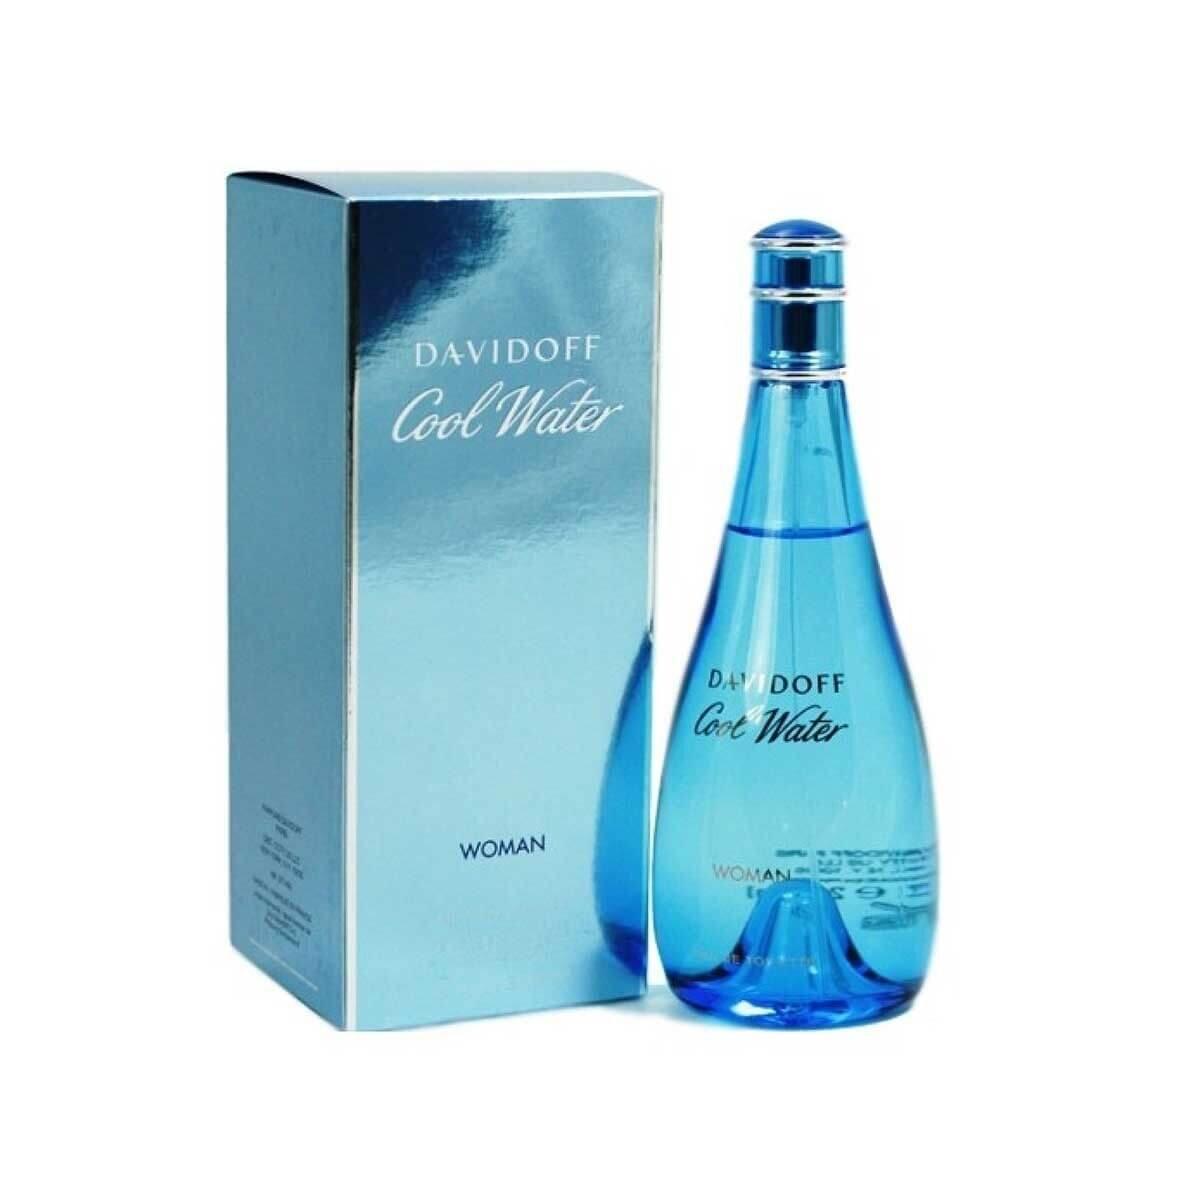 Cool Water Kadın Parfüm Edt 100 ml